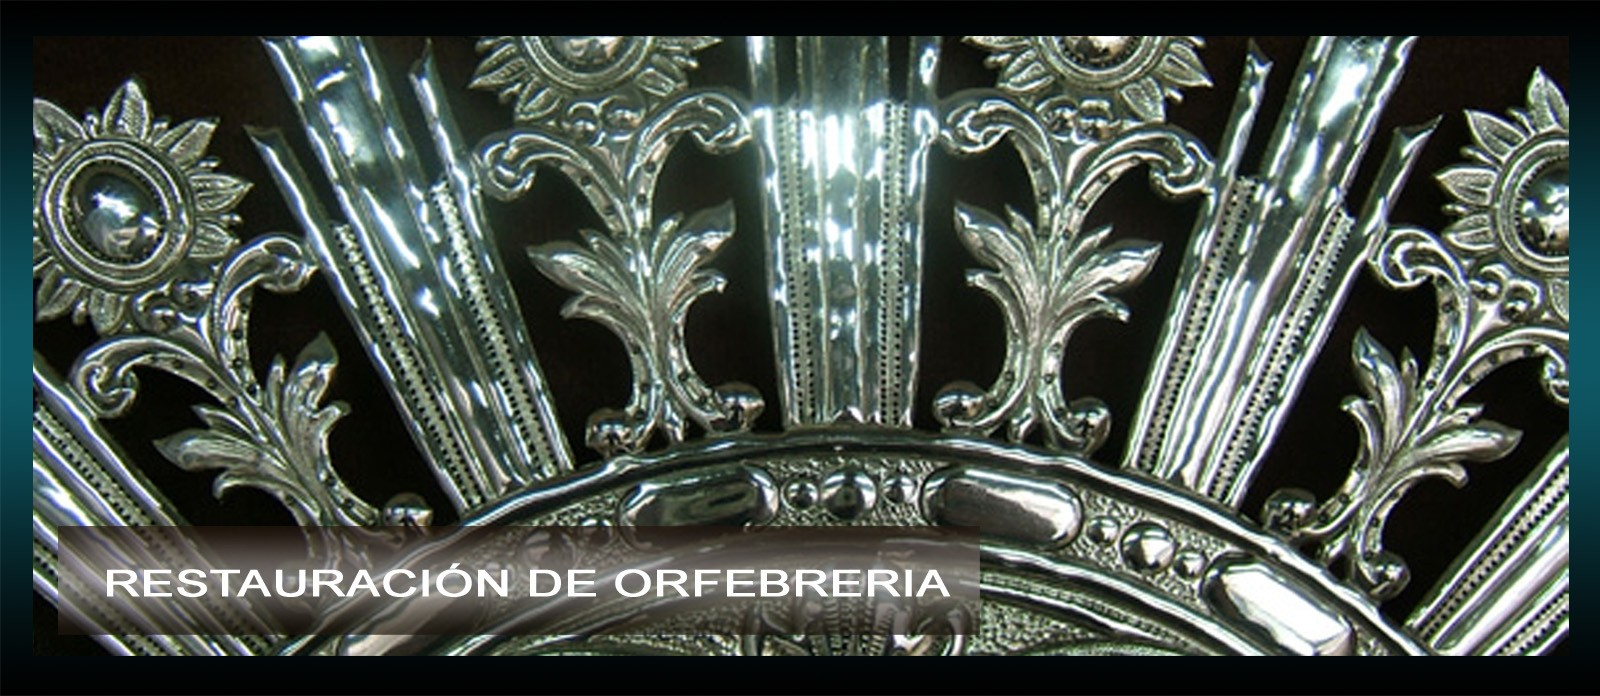 RESTAURACIÓN DE ORFEBRERIA.